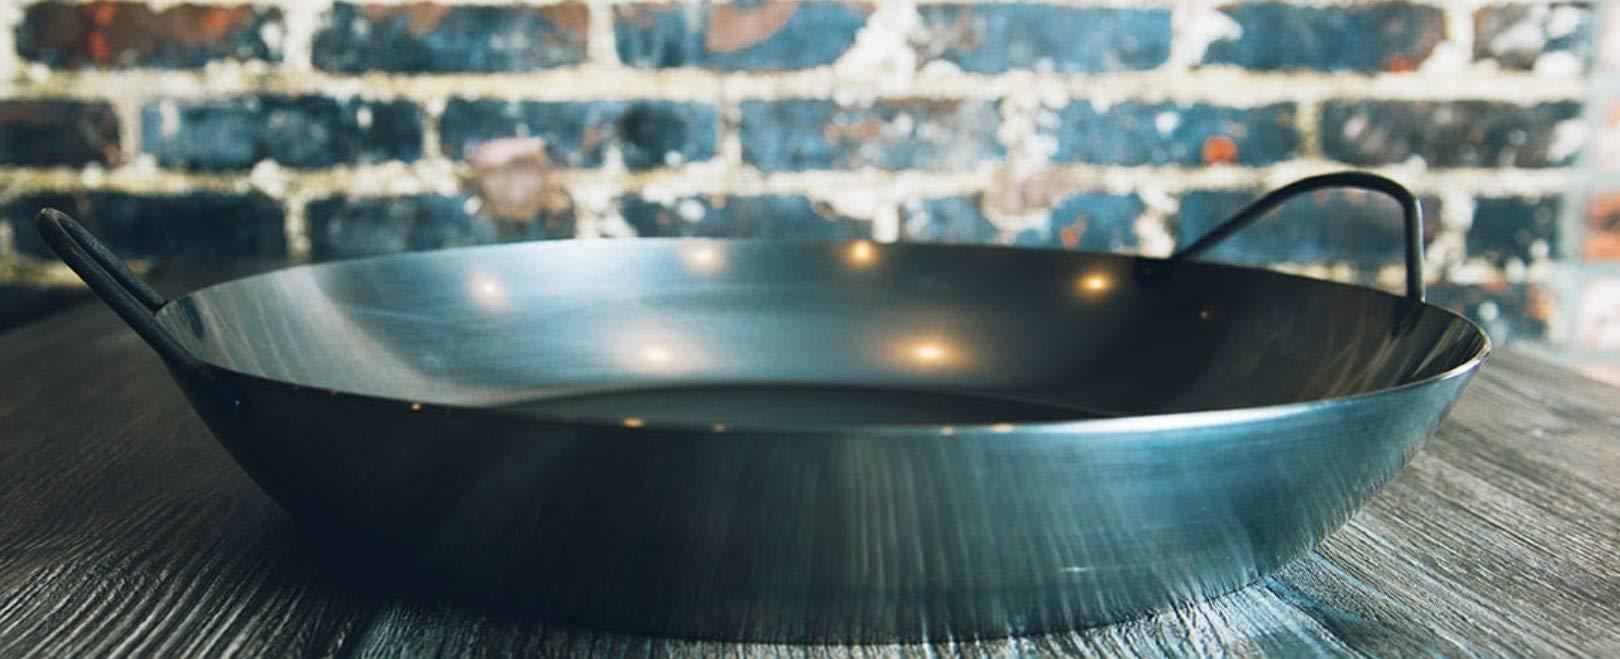 Matfer Bourgeat 062052 Black Steel Paella Pan, 15-3/4 In. Diameter by Matfer Bourgeat